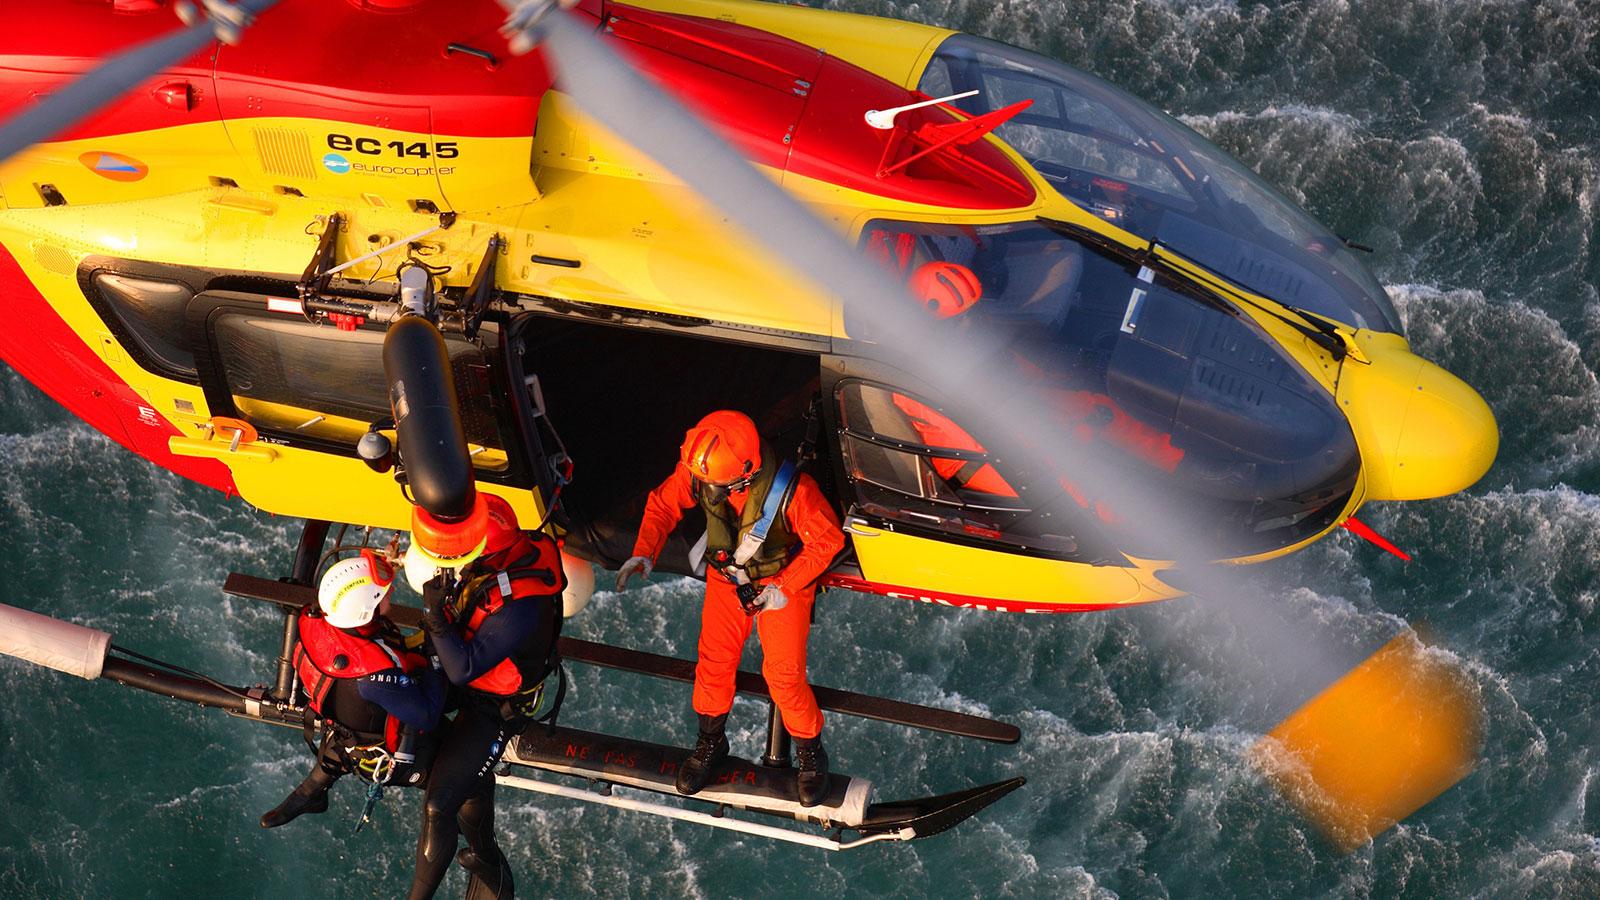 Bild: Eurocopter